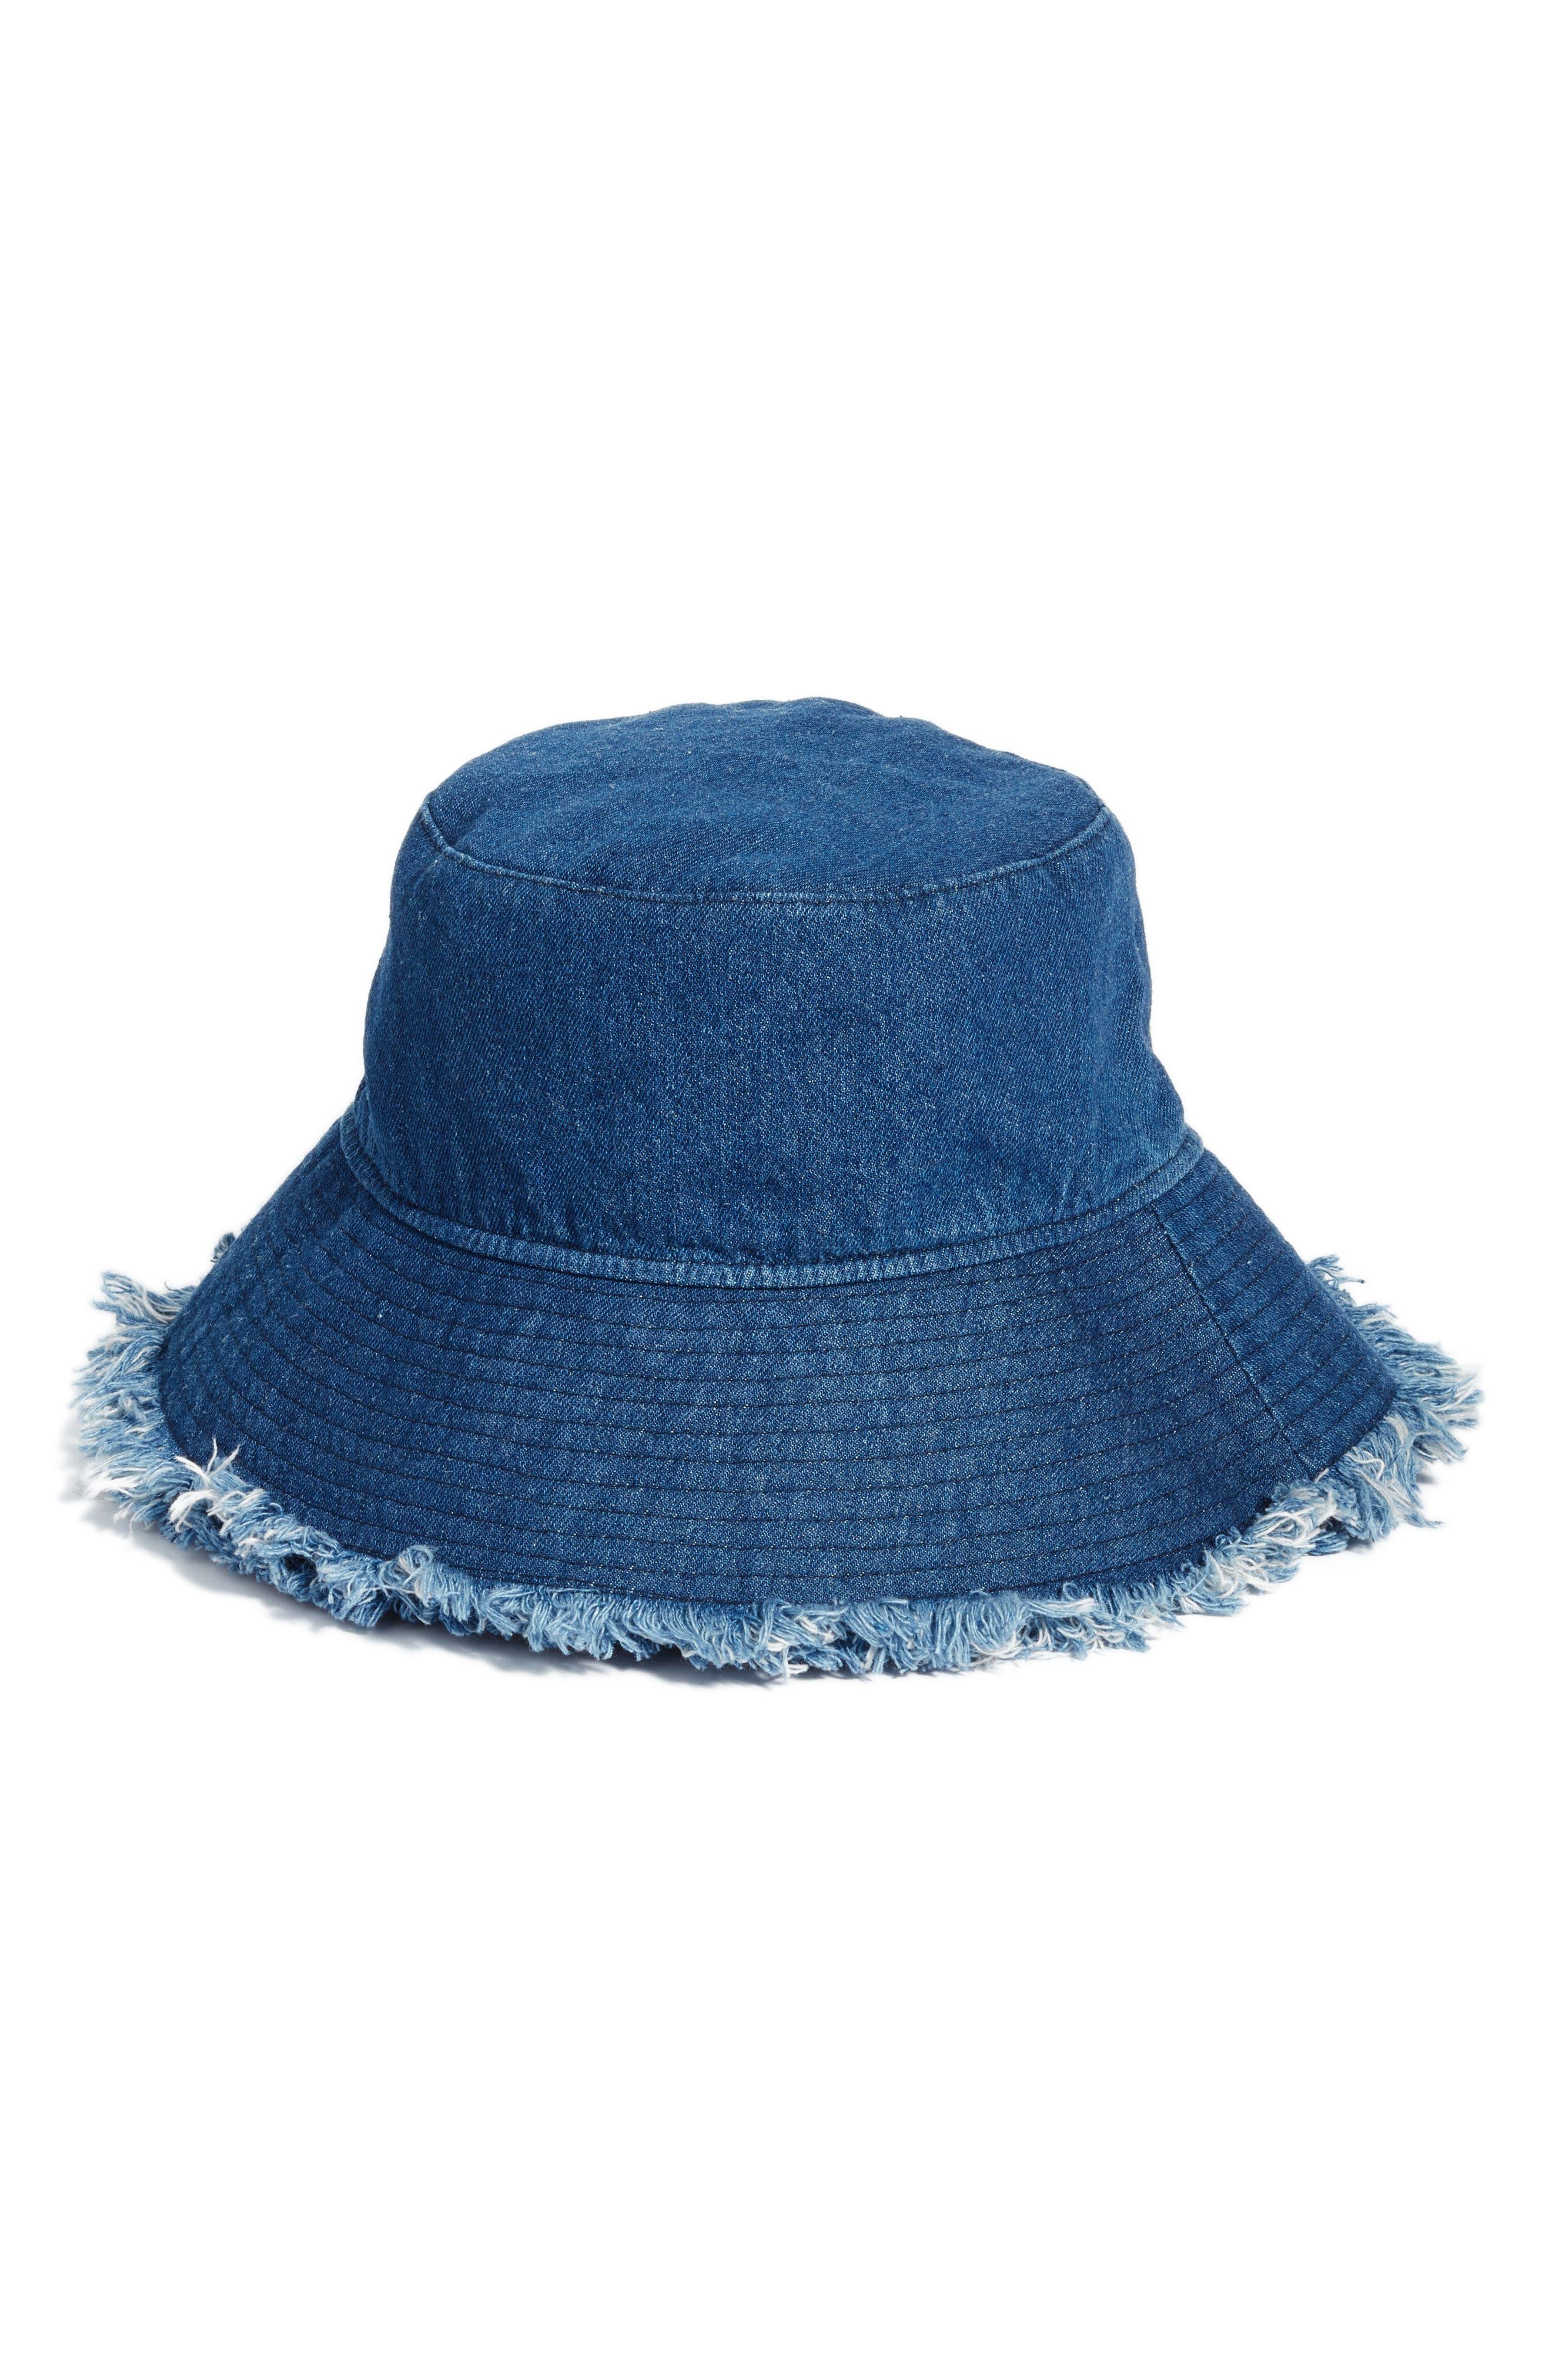 Alternate Image 1 Selected - Trasure & Bond Denim Bucket Hat